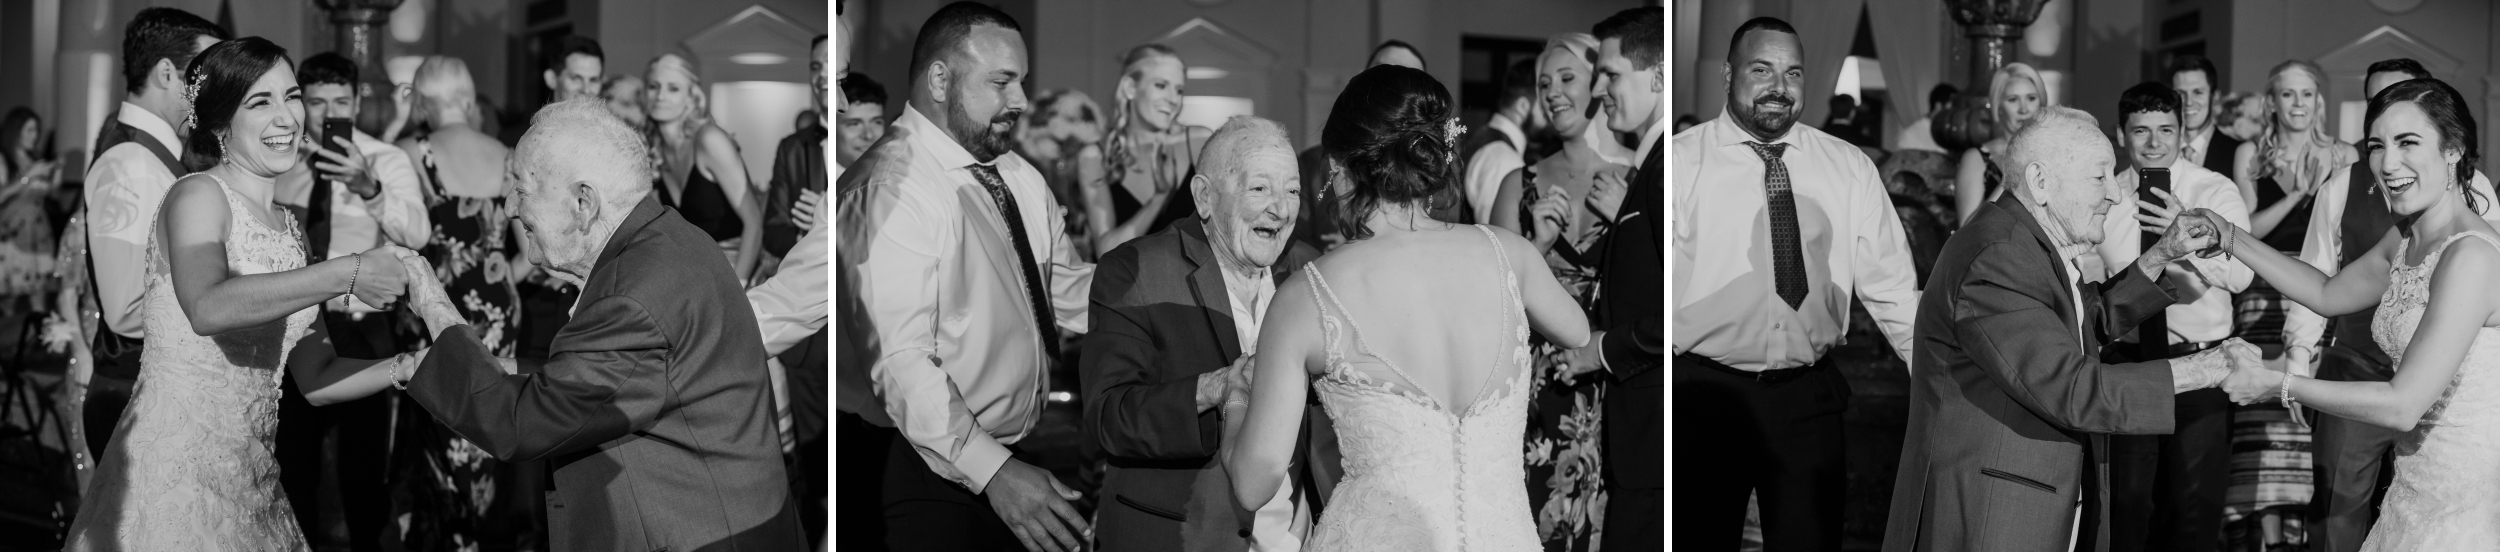 Wedding Hotel Colonnade Coral Gables - Santy Martinez 33.jpg